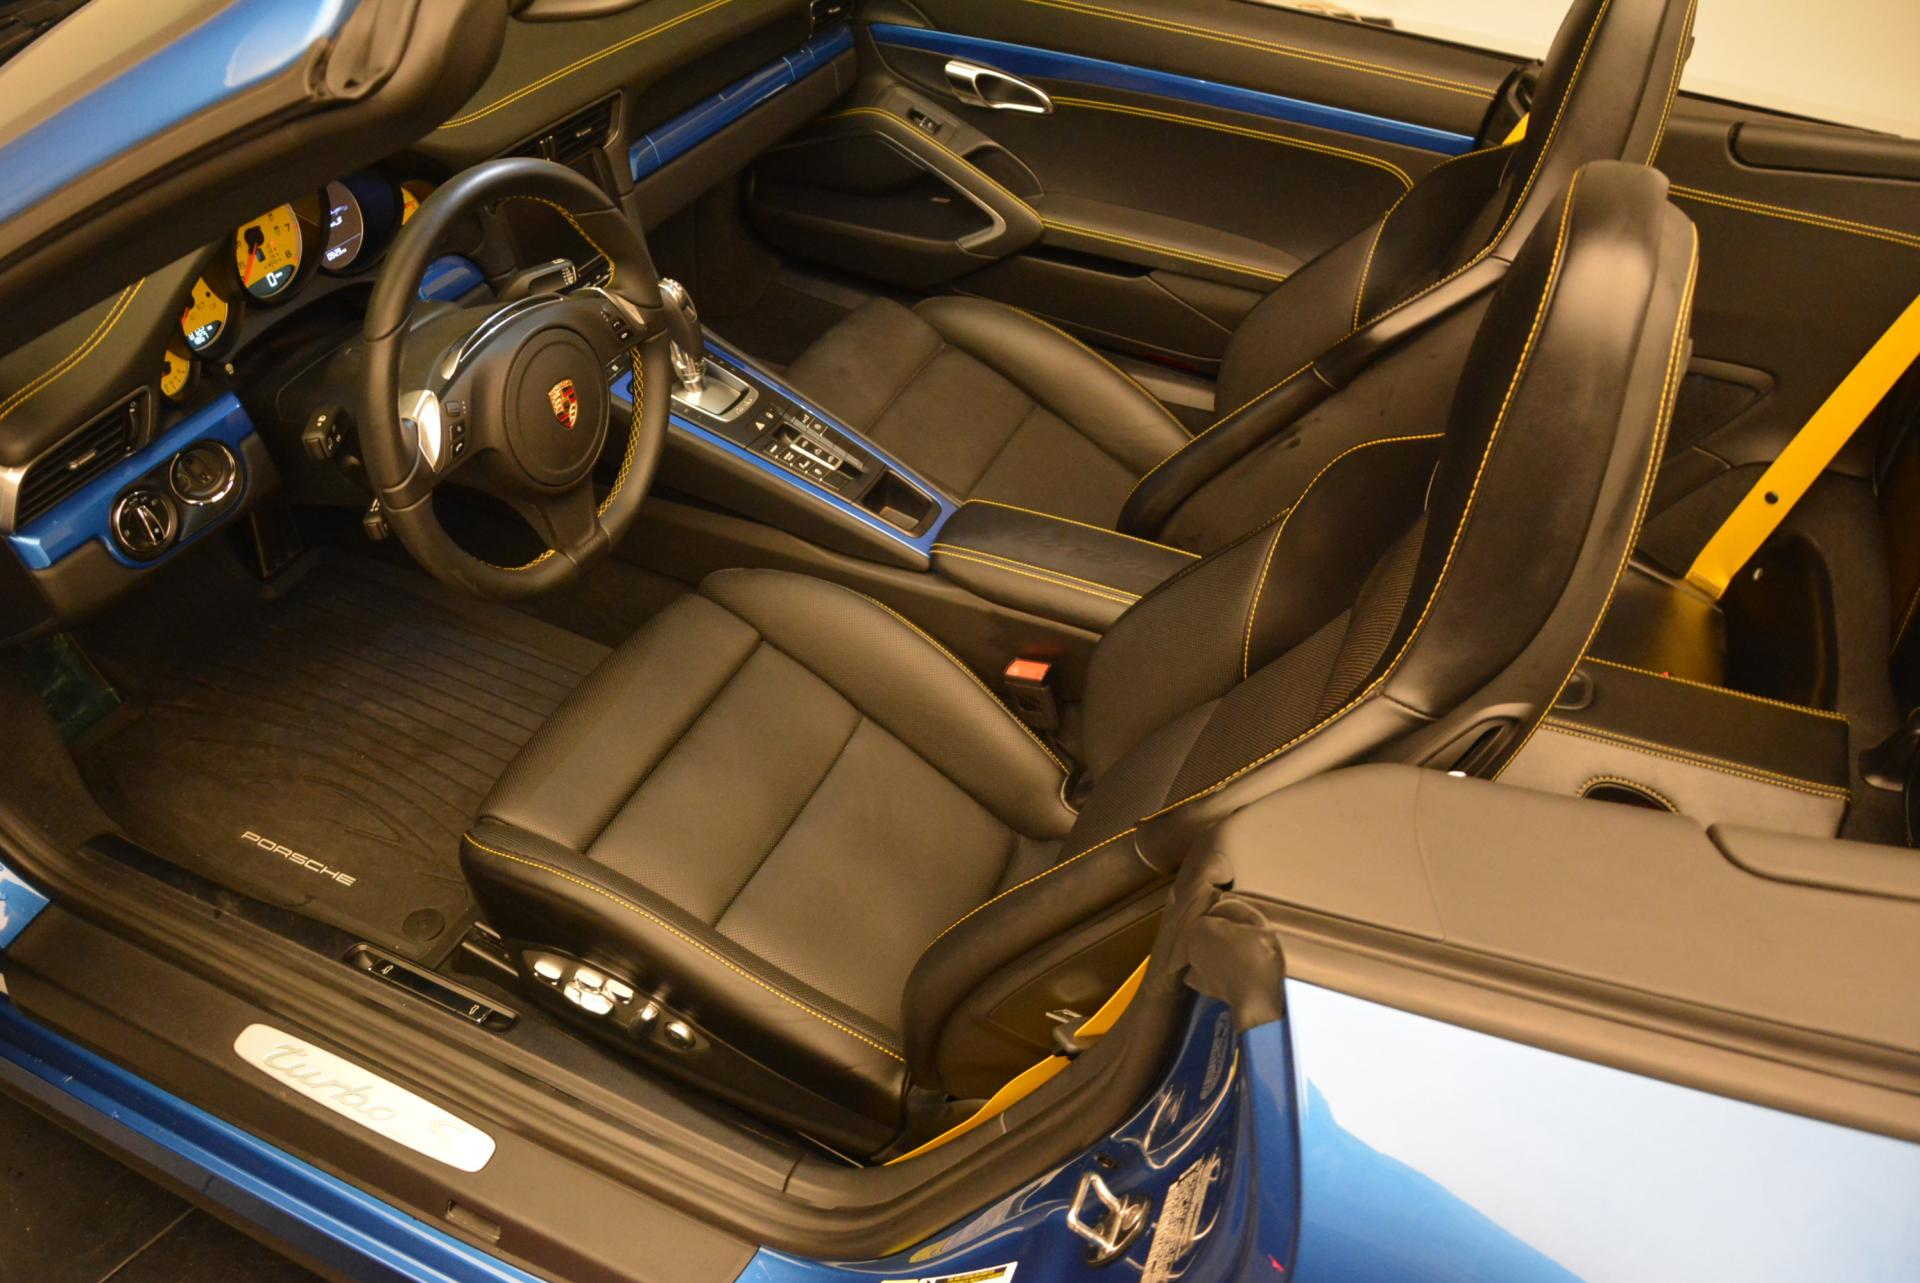 Used 2014 Porsche 911 Turbo S For Sale In Greenwich, CT 105_p17